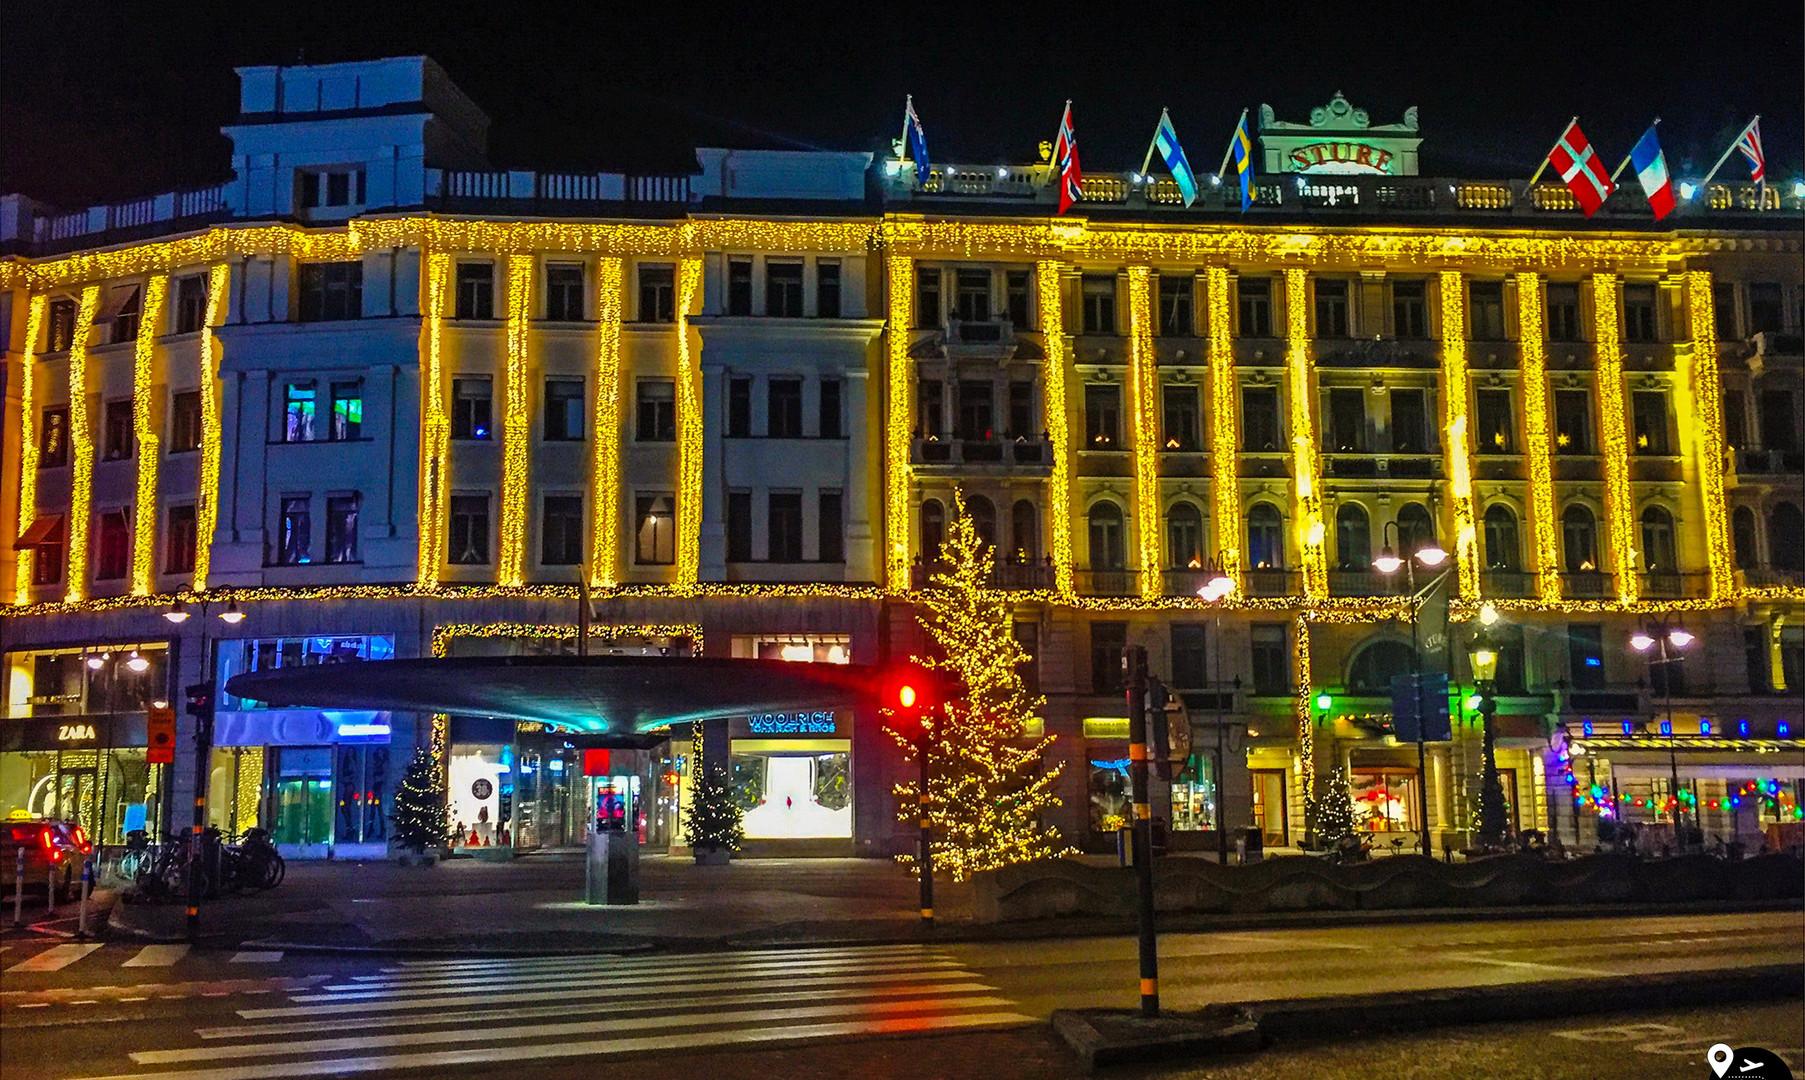 Площадь Стуреплан, Стокгольм